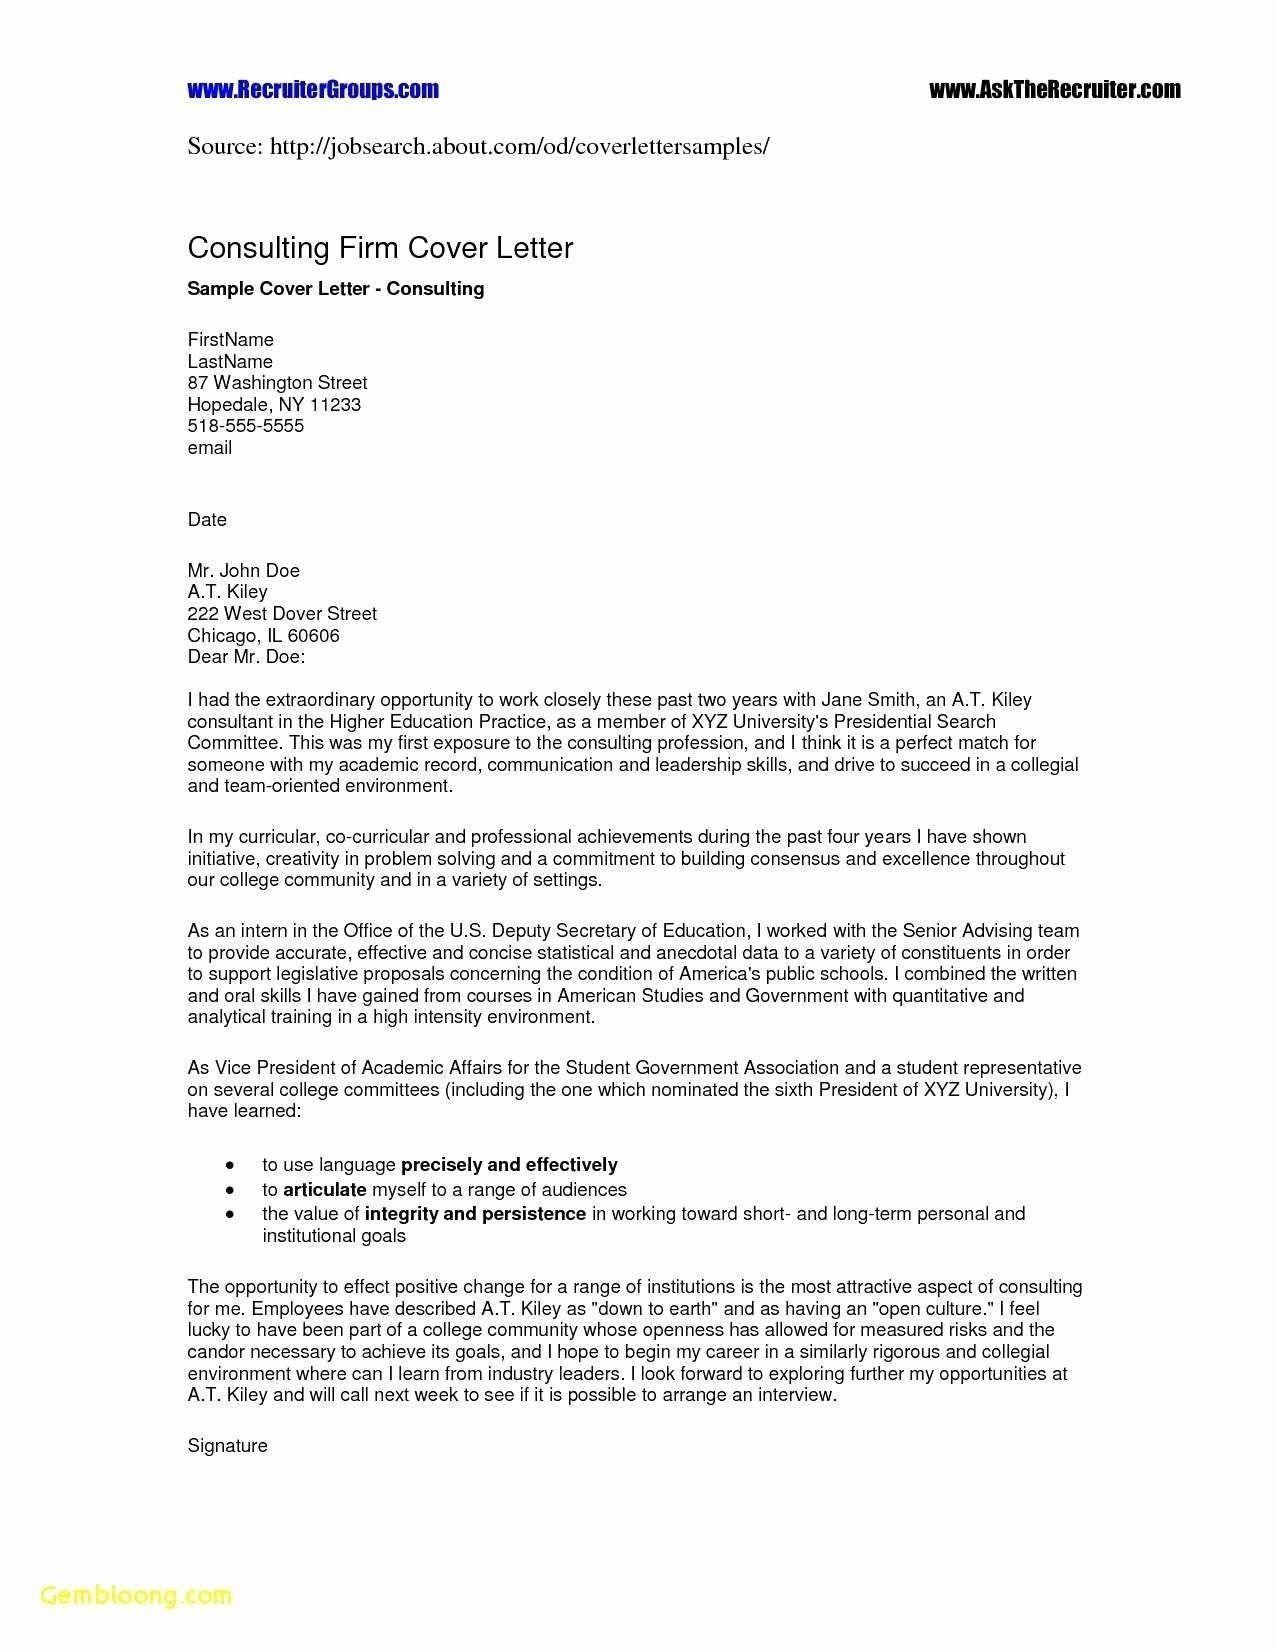 Resume For 16 Year Olds Fresh 11 Resume Template For 16 Year Old Ideas Job Cover Letter Cover Letter Sample Cover Letter For Resume